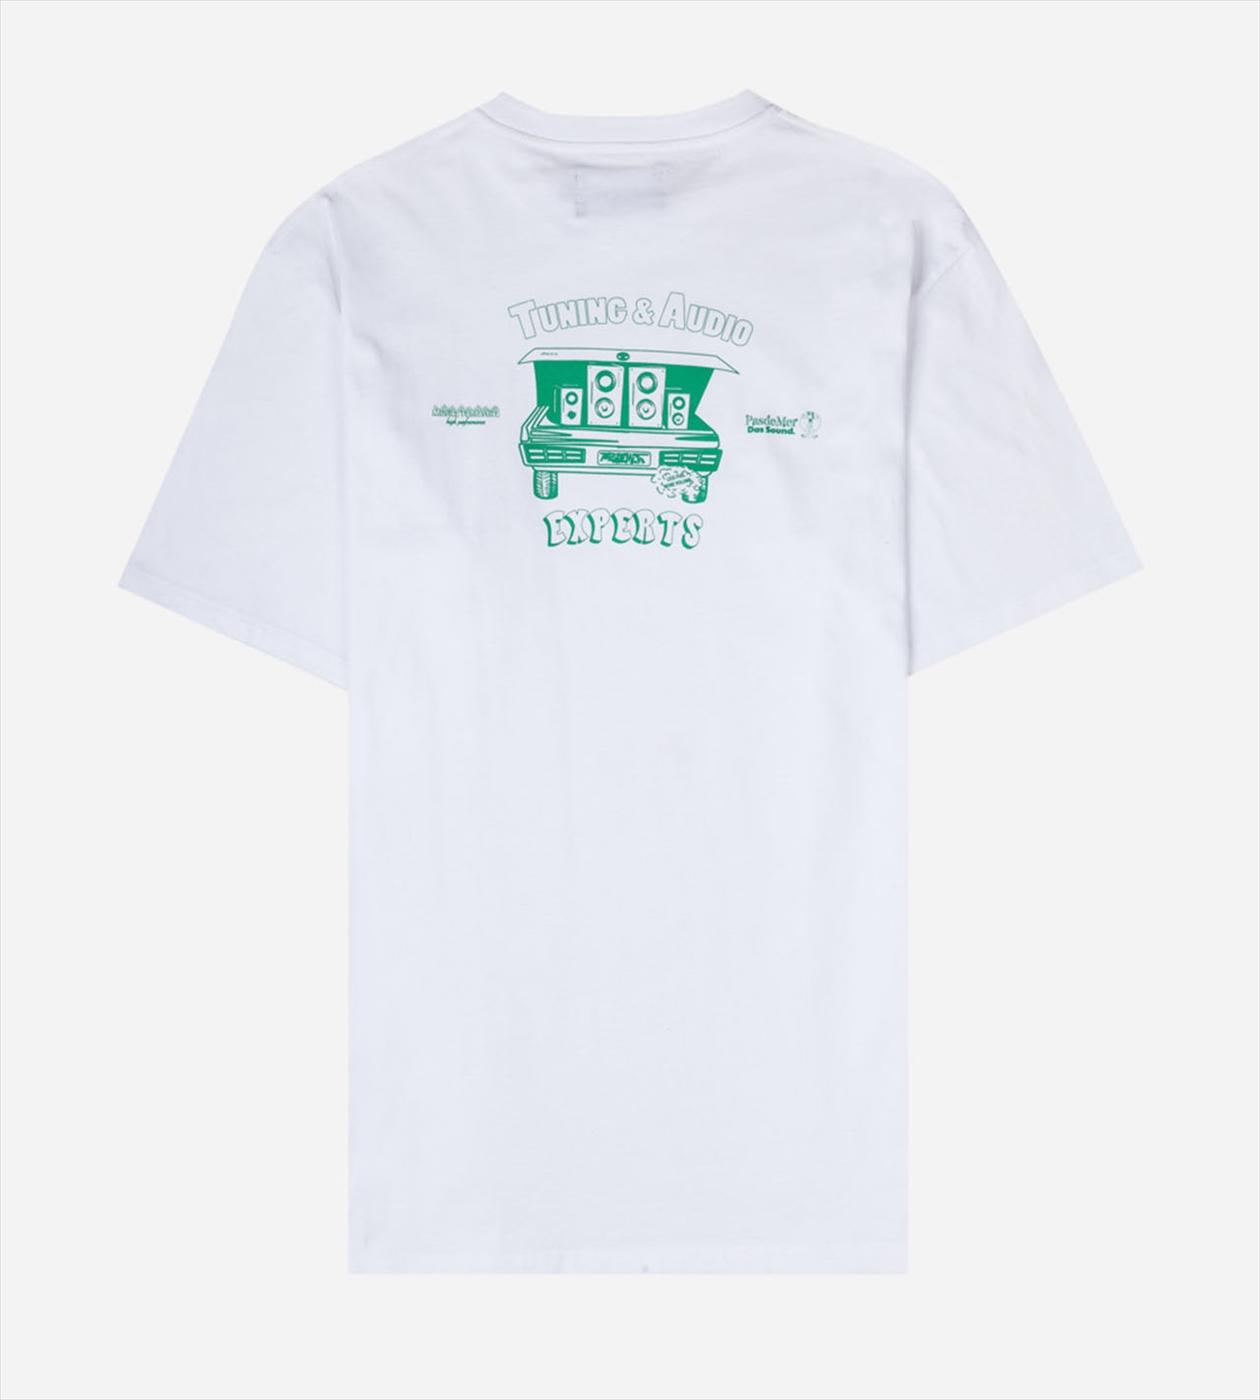 【PAS DE MER/パドゥメ】DAS RADIO T-SHIT  Tシャツ / WHITE